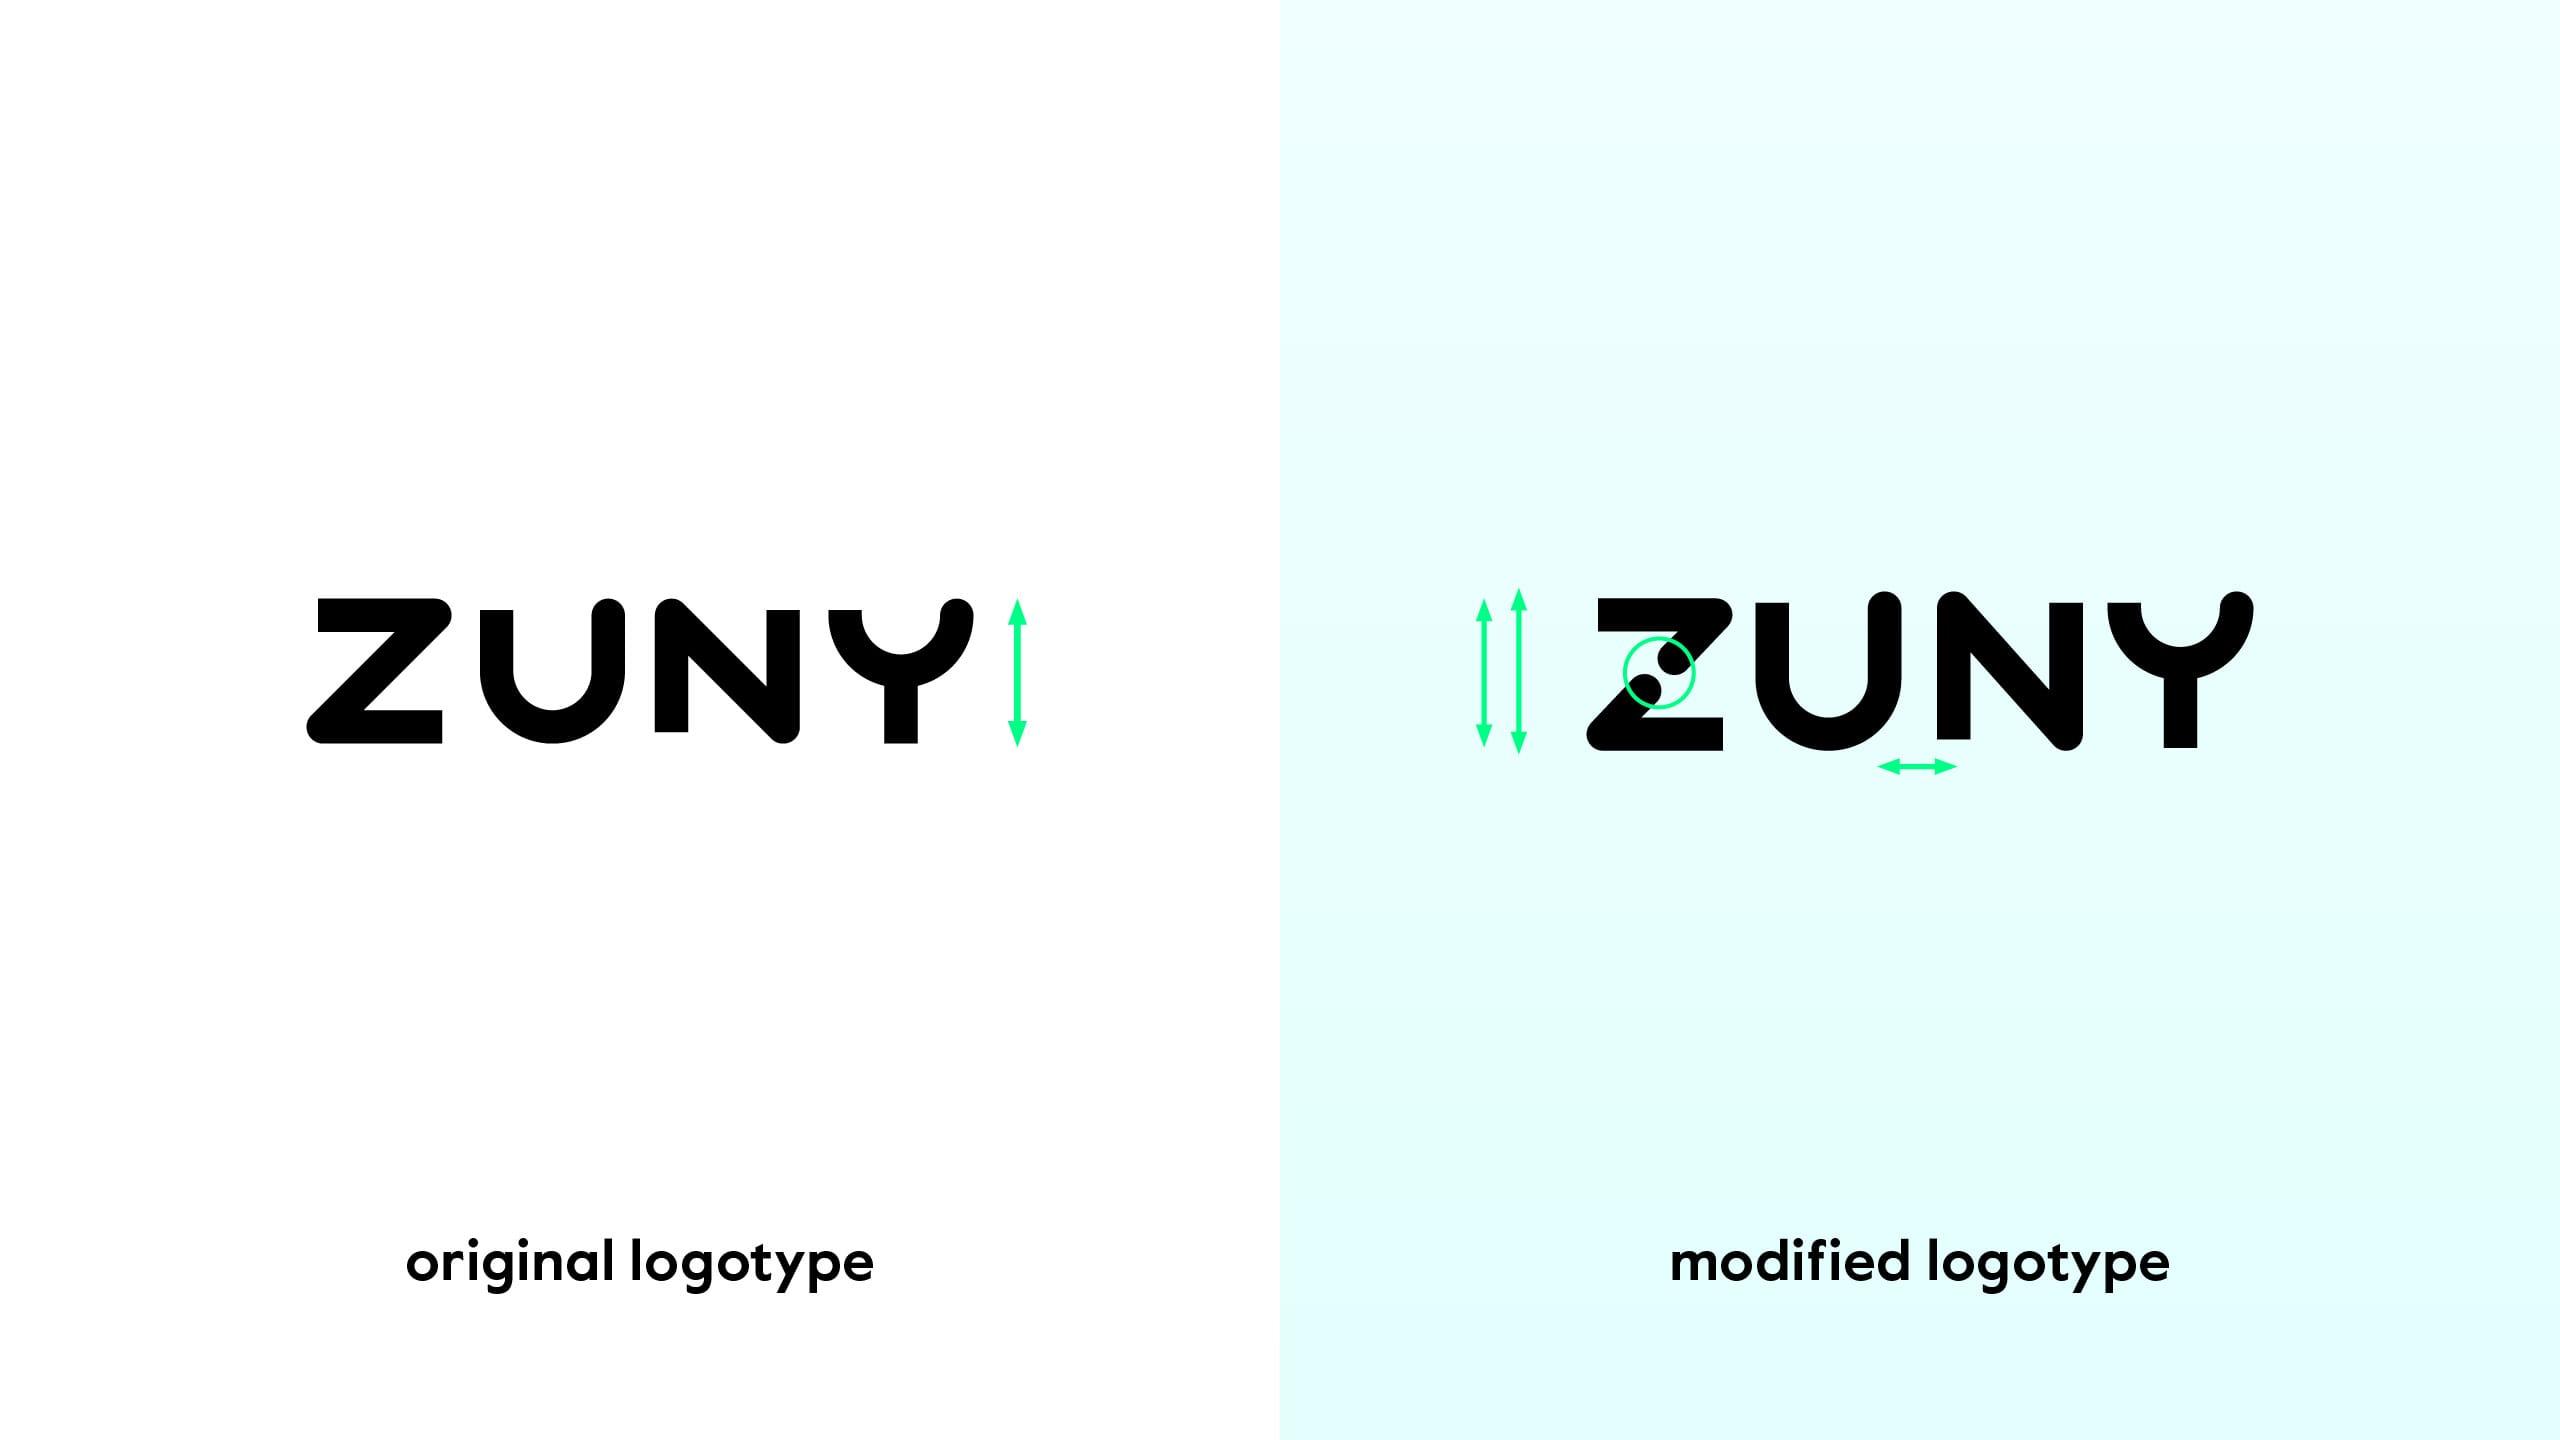 ZUNY-3-logo-rework